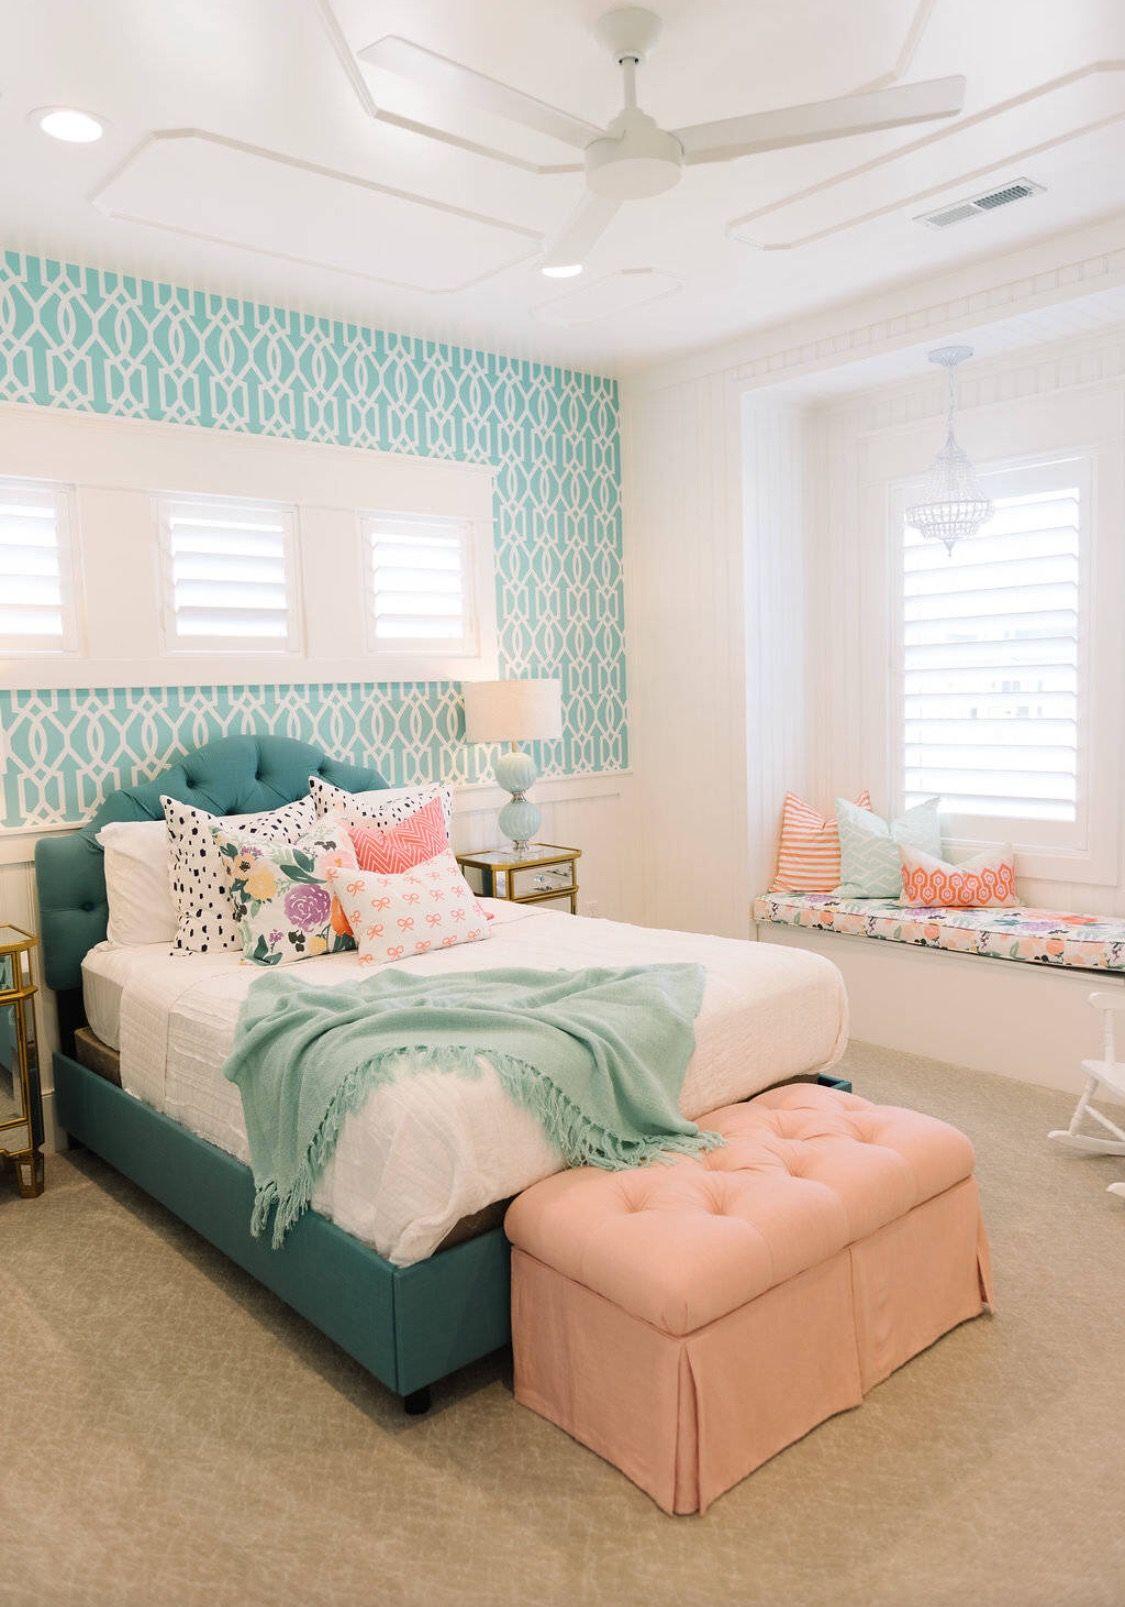 I Love The Sweet Simple Look Of This Bedroom Space Via Houzz Bedr Decoracion De Dormitorios Juveniles